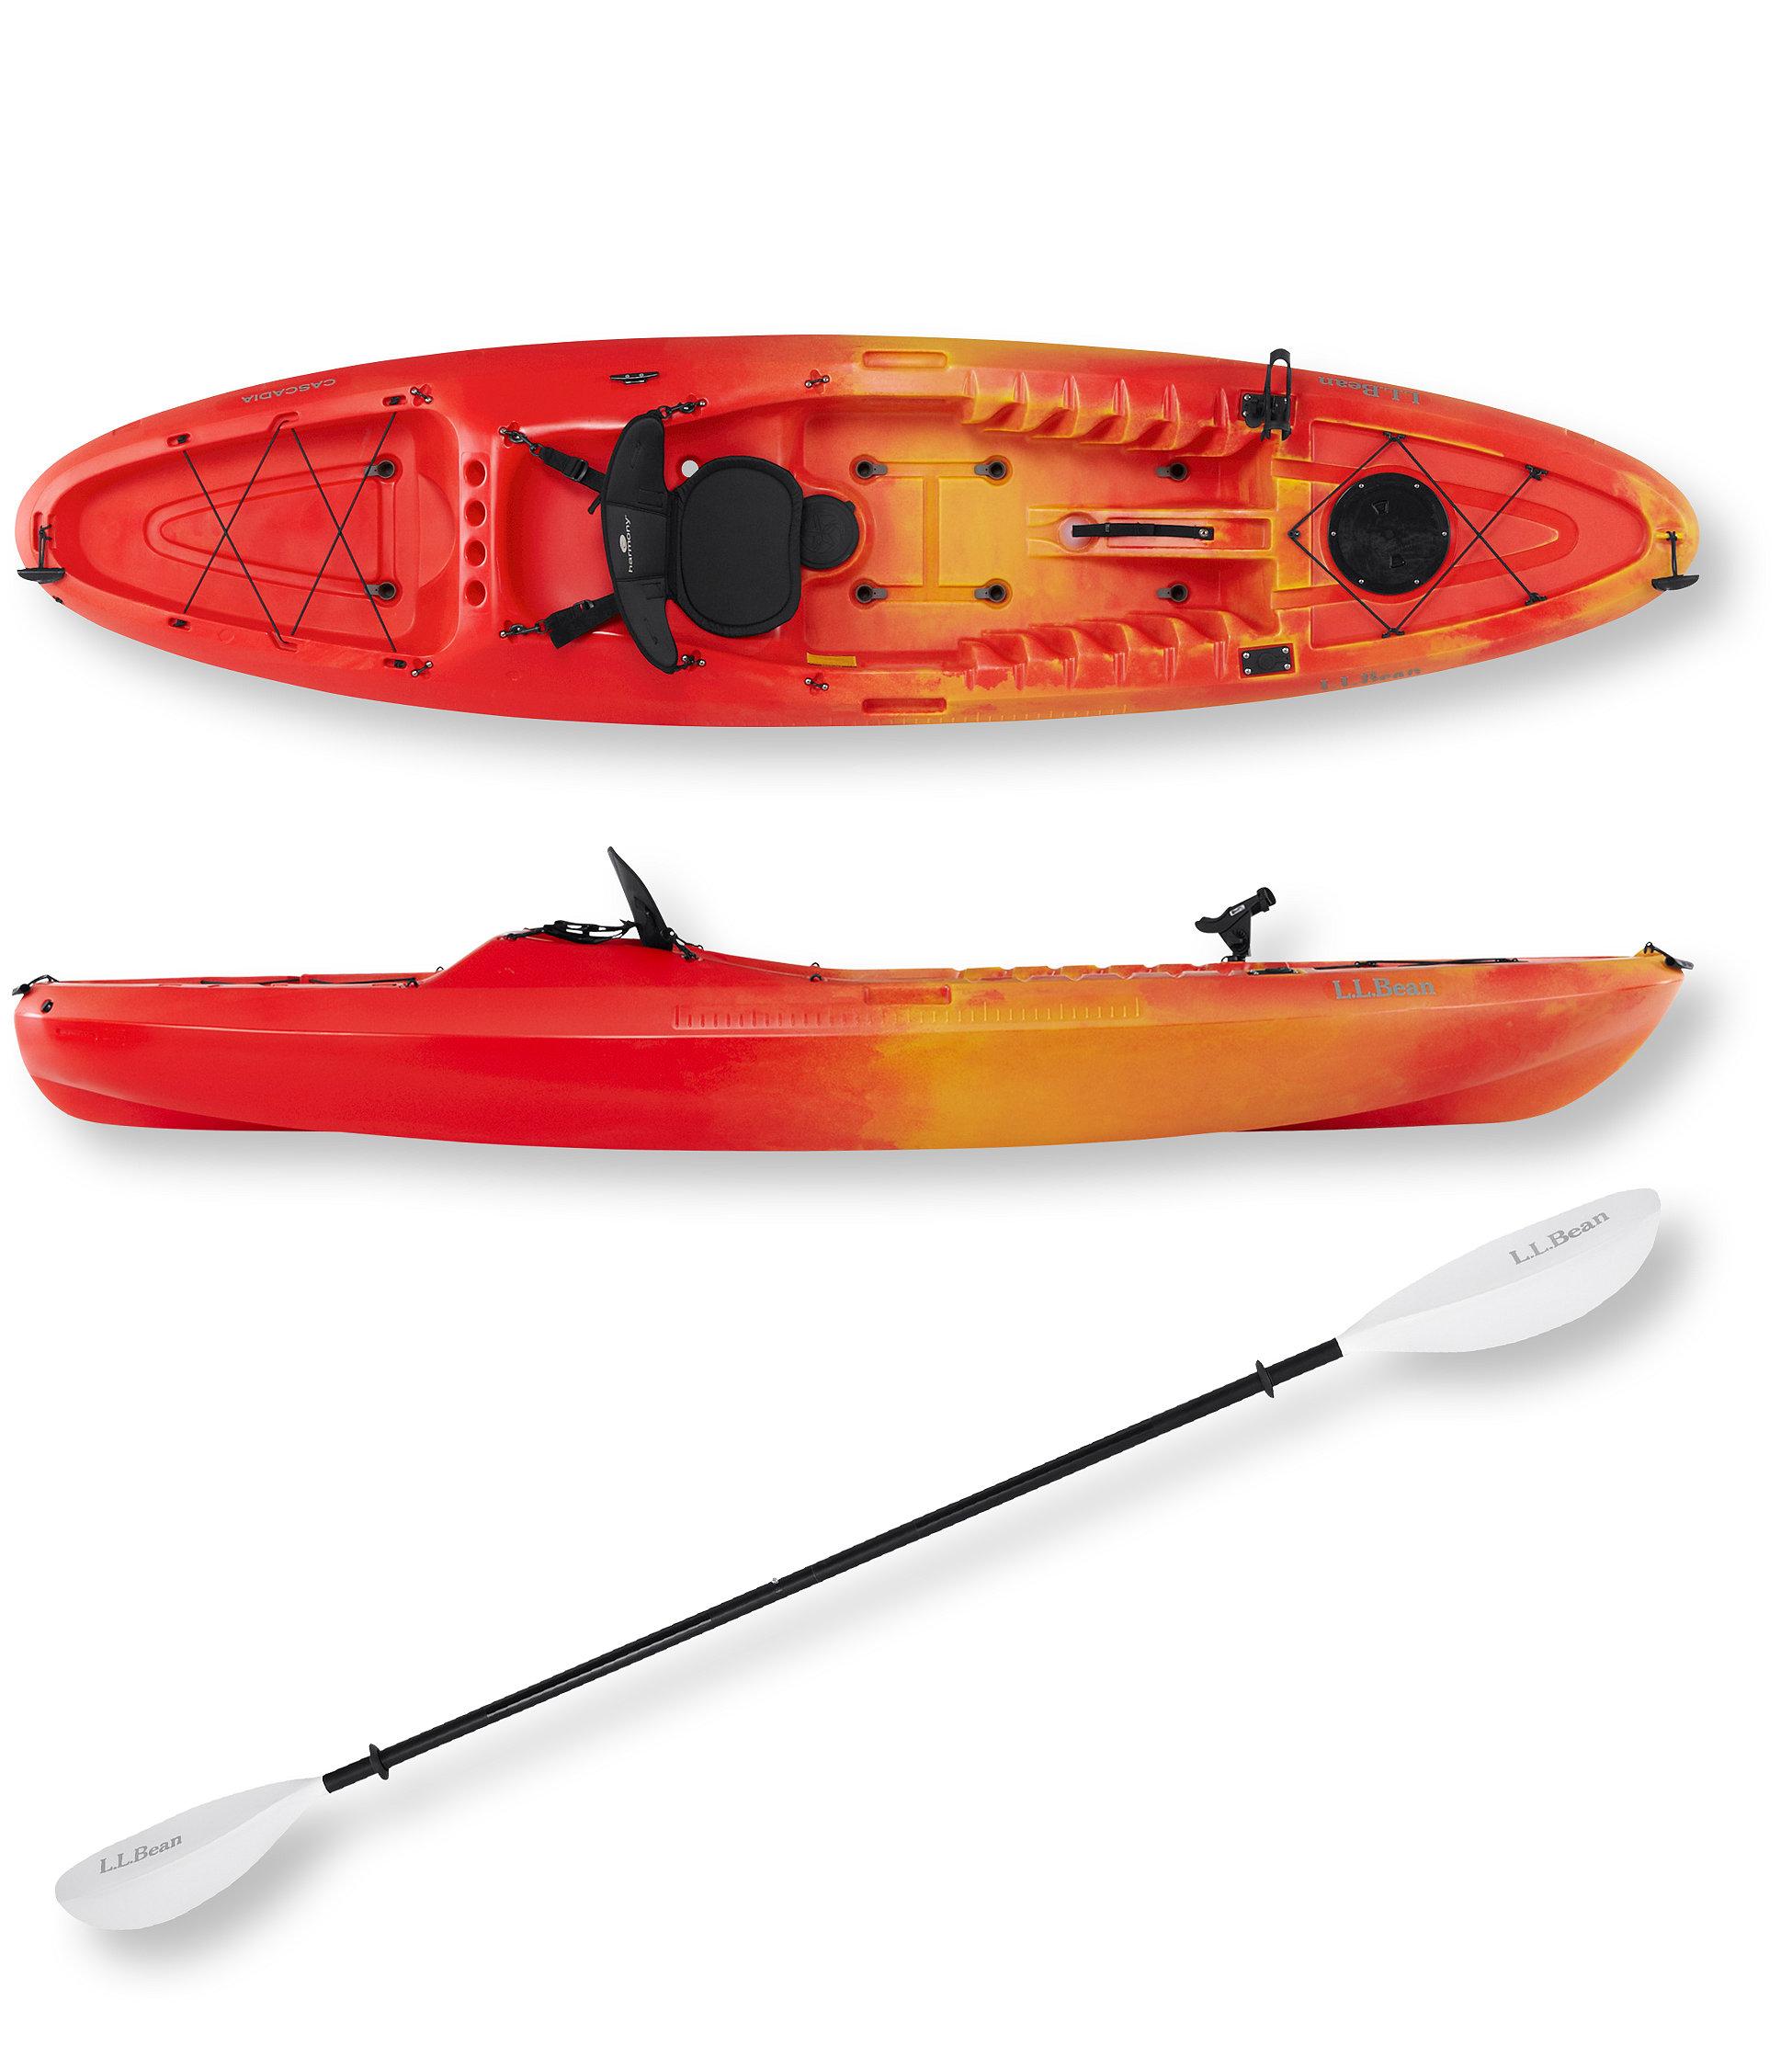 L.L.Bean Cascadia Angler Sit-On-Top Kayak